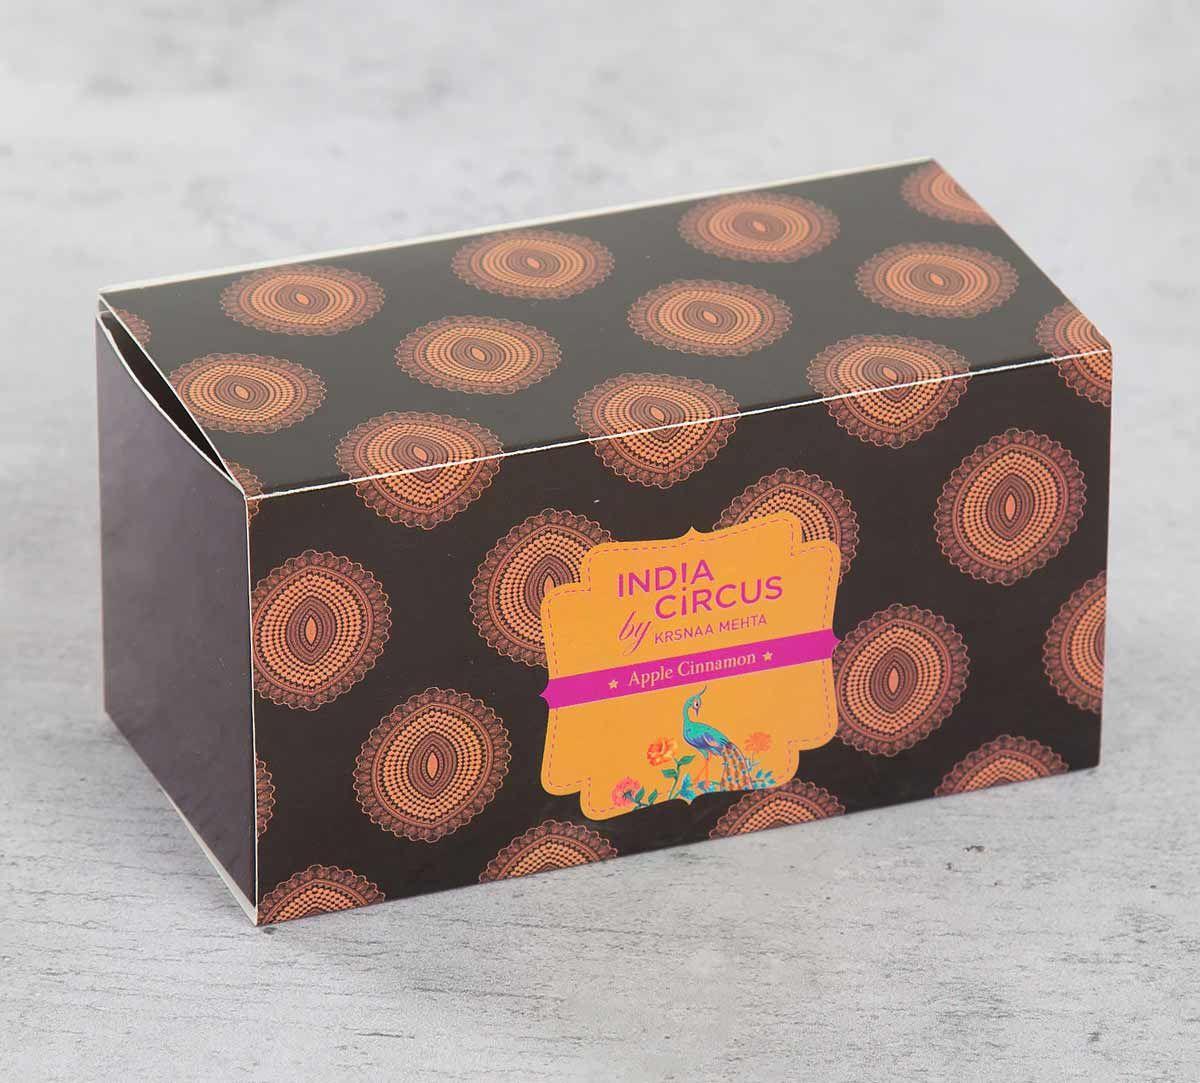 India Circus Apple Cinnamon Glass Votives